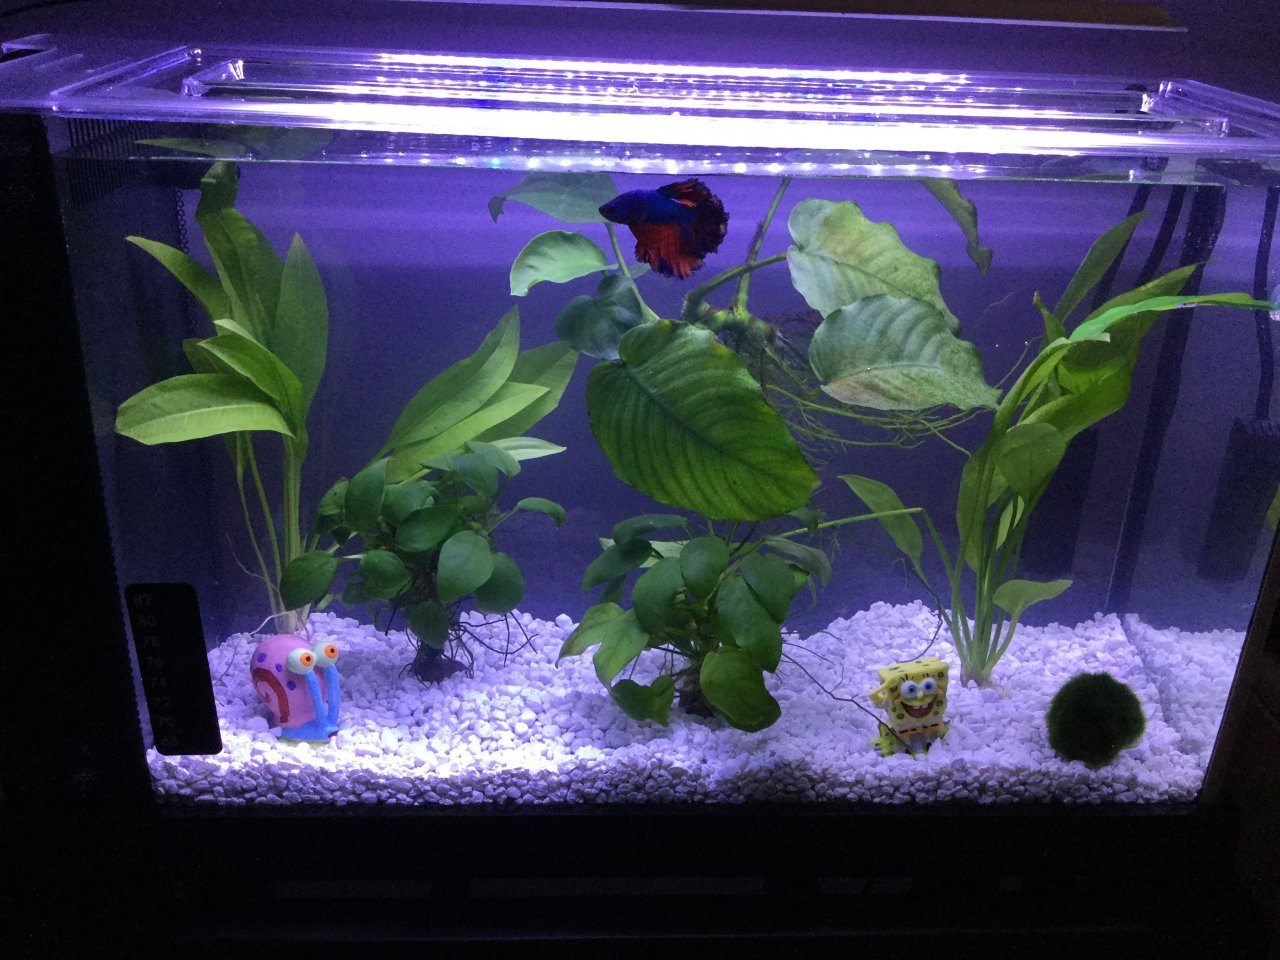 Fluval Spec V Tank Flow Issues My Aquarium Club